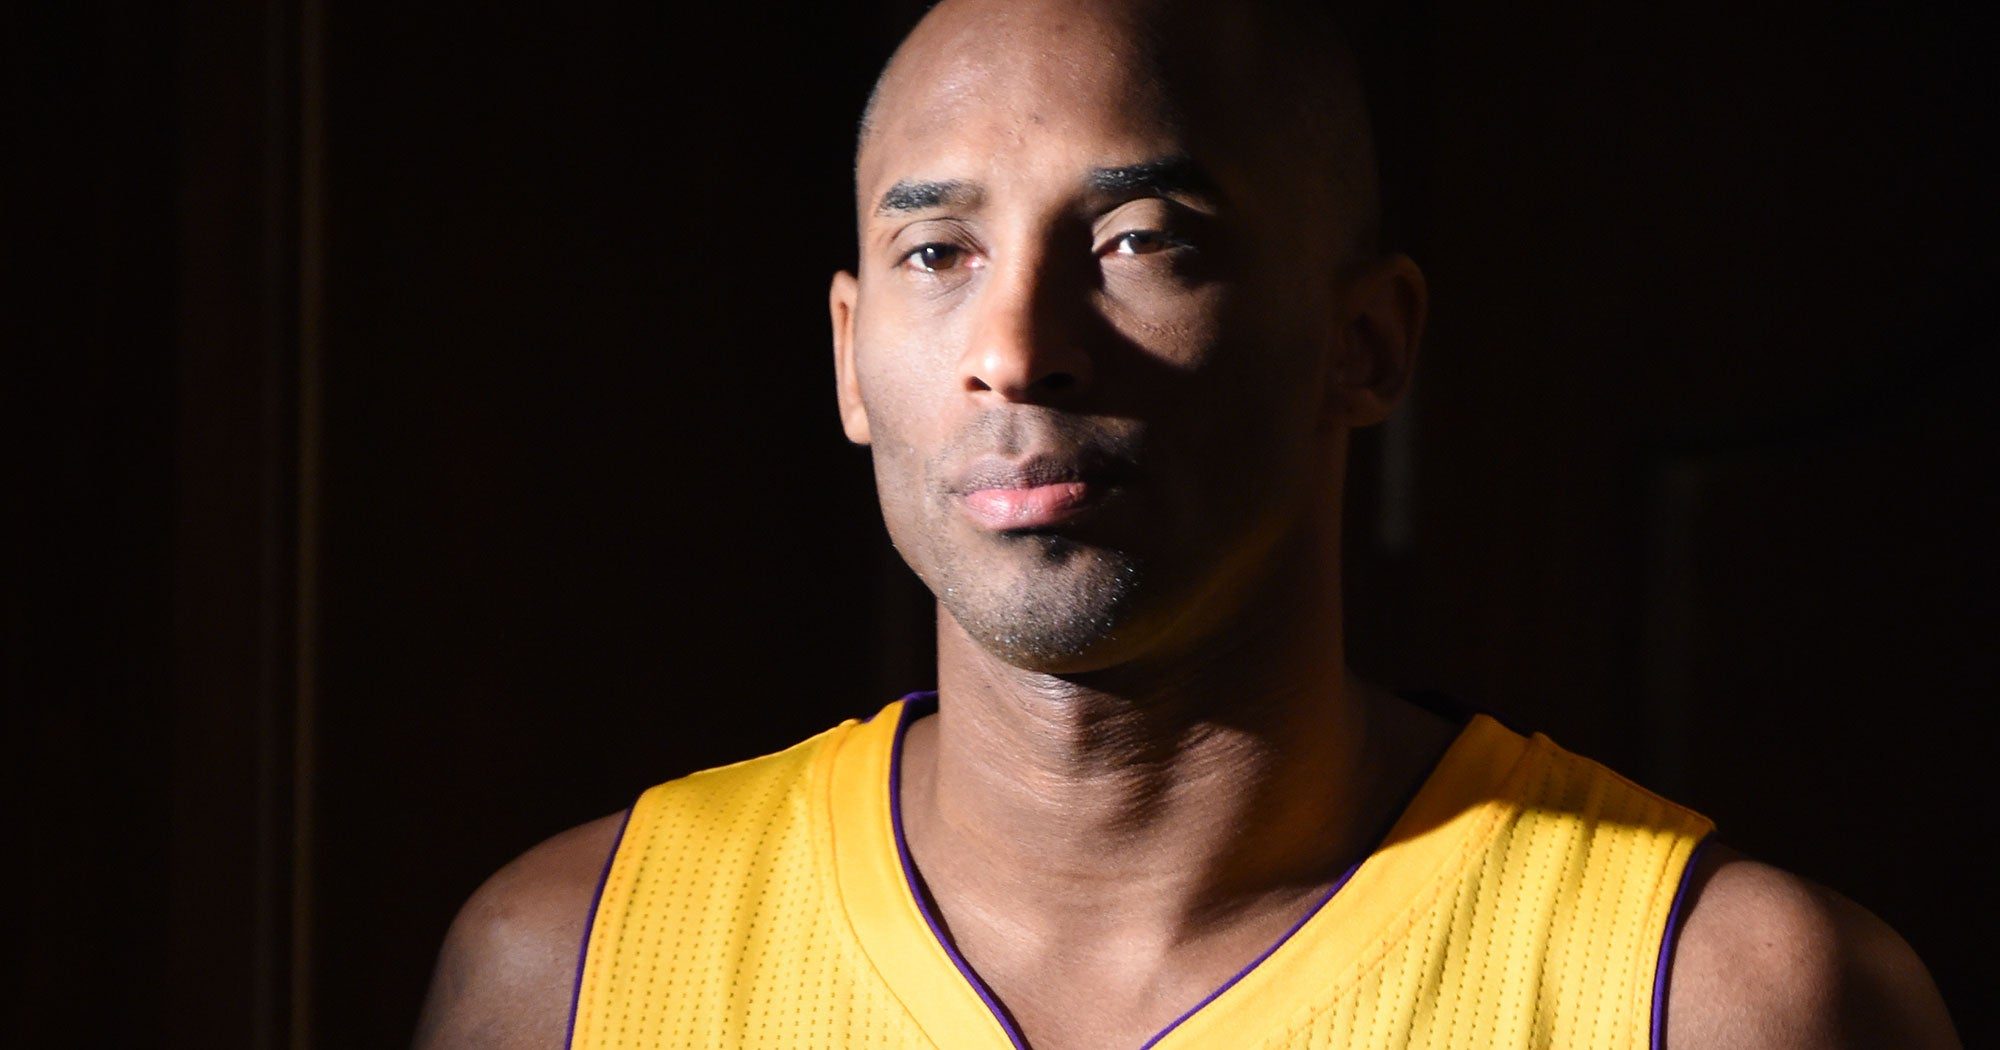 Kobe Bryant, Former NBA Star, Is Dead At 41